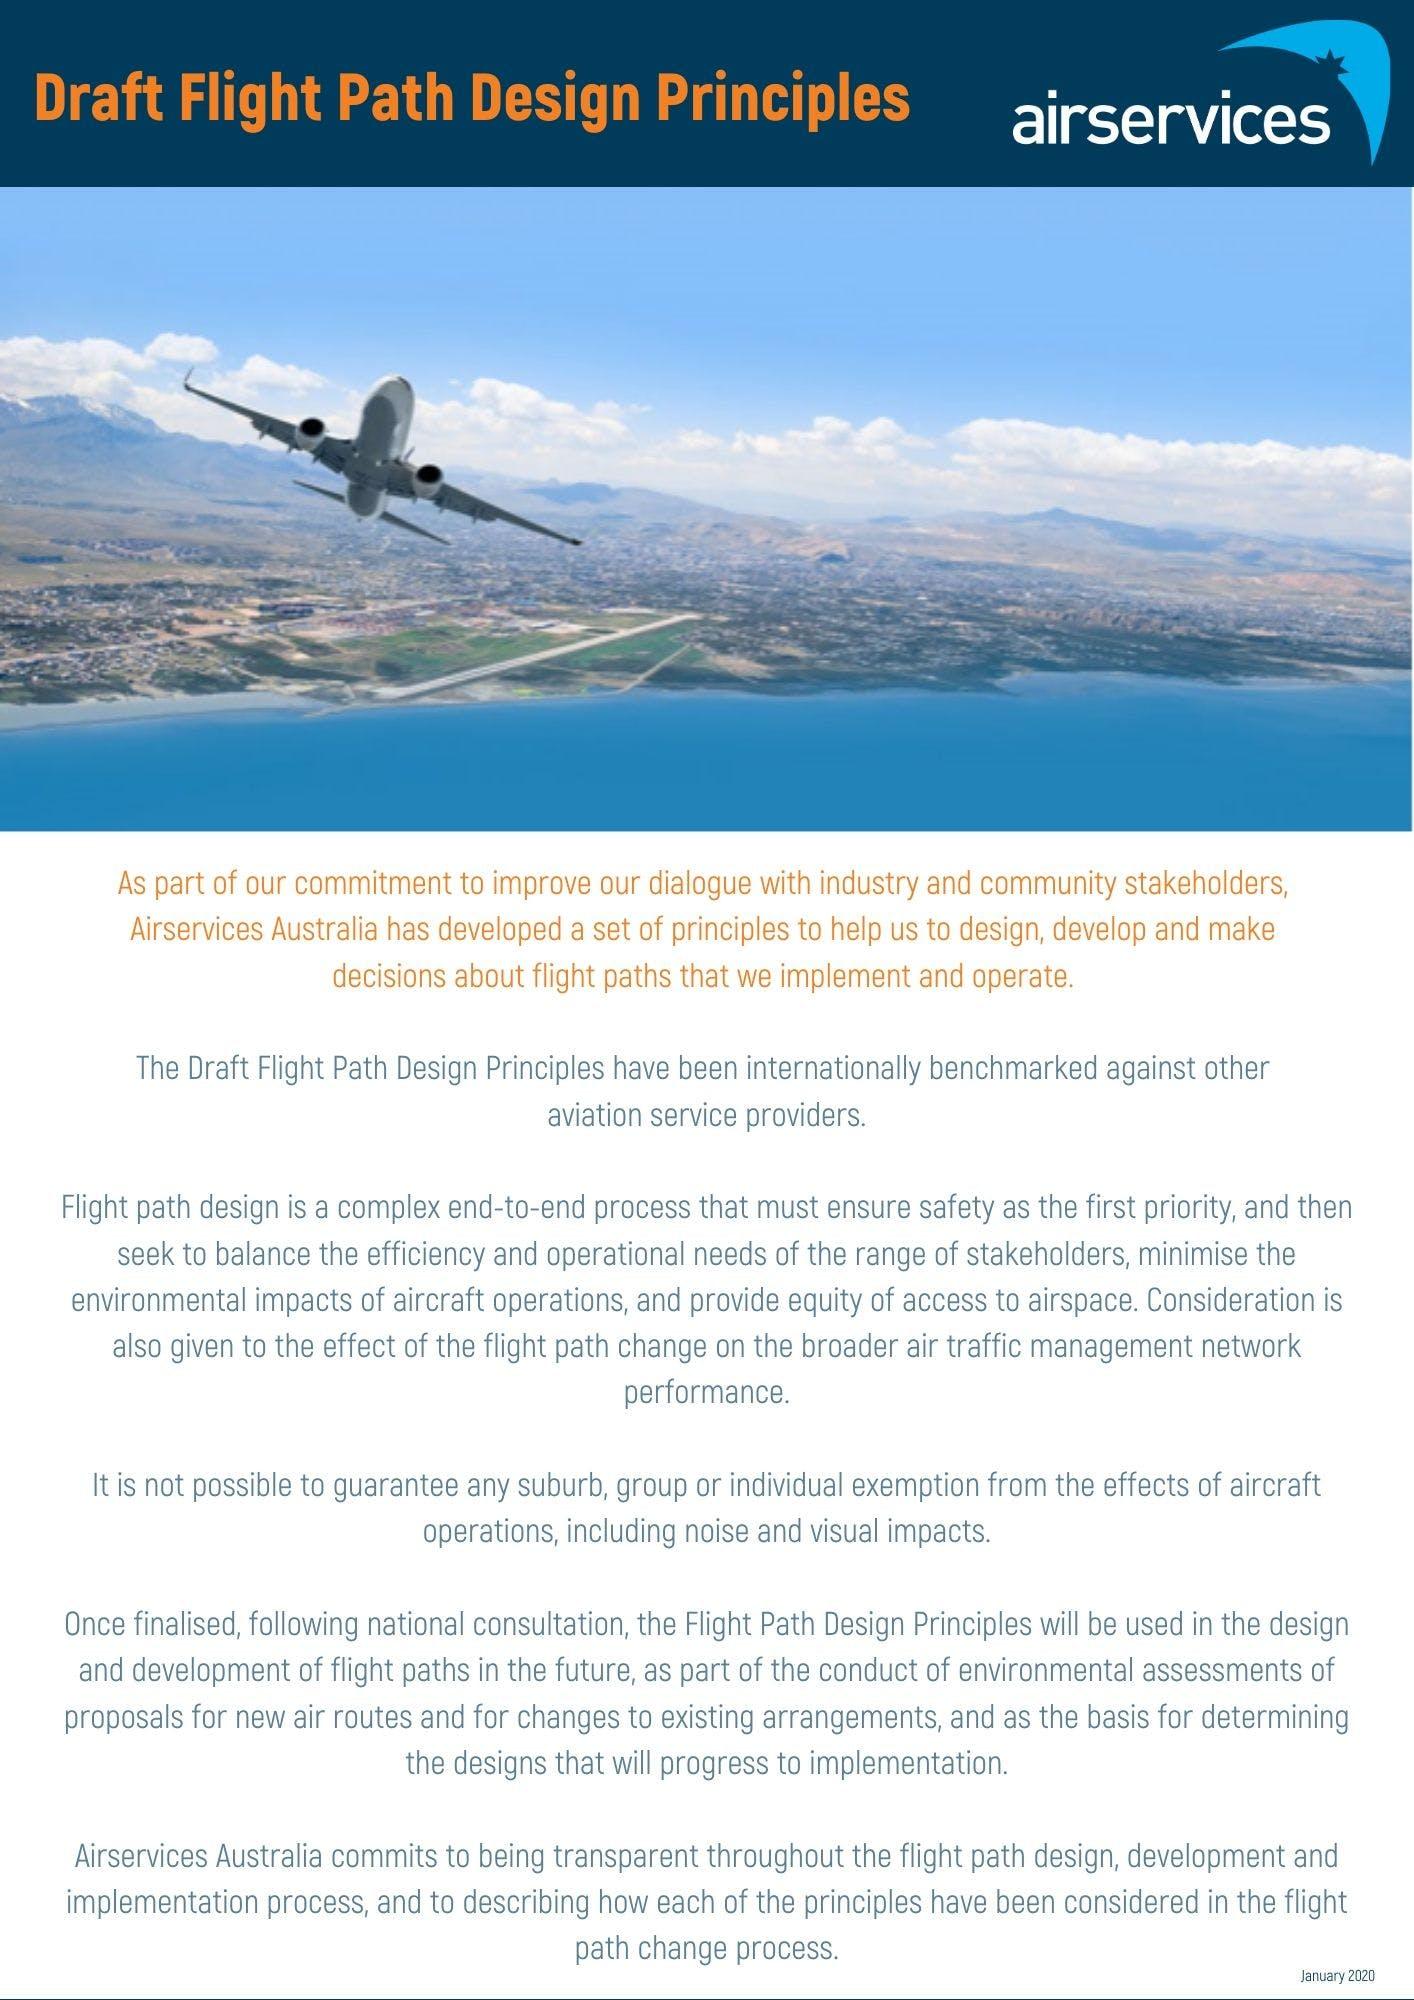 Draft Flight Path Design Principles Fact Sheet (January 2020) page 1